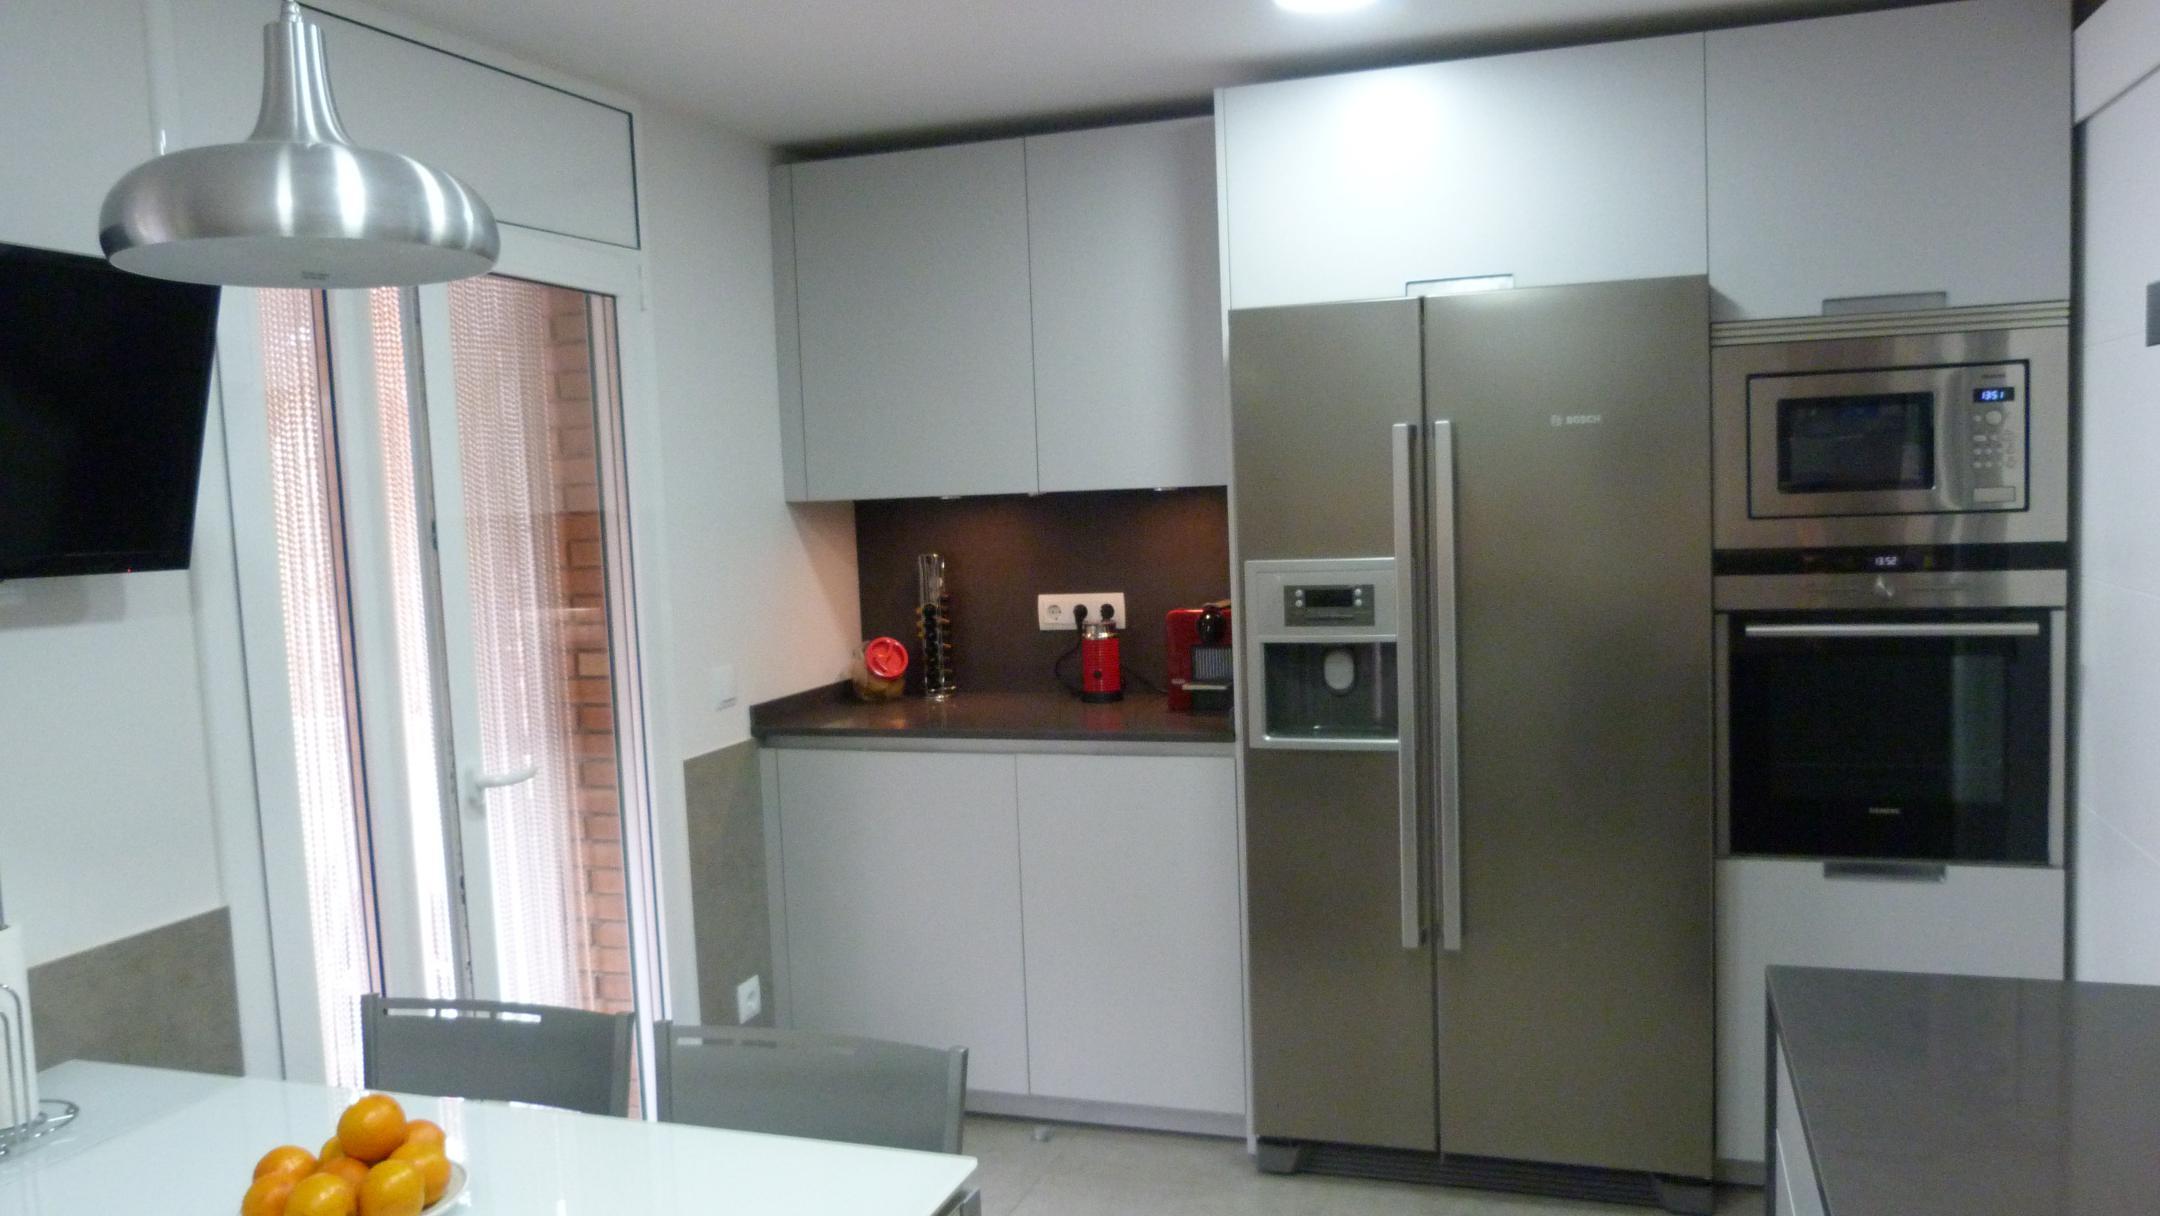 Spanish market good performances for refrigerators ha for Mueble para microondas